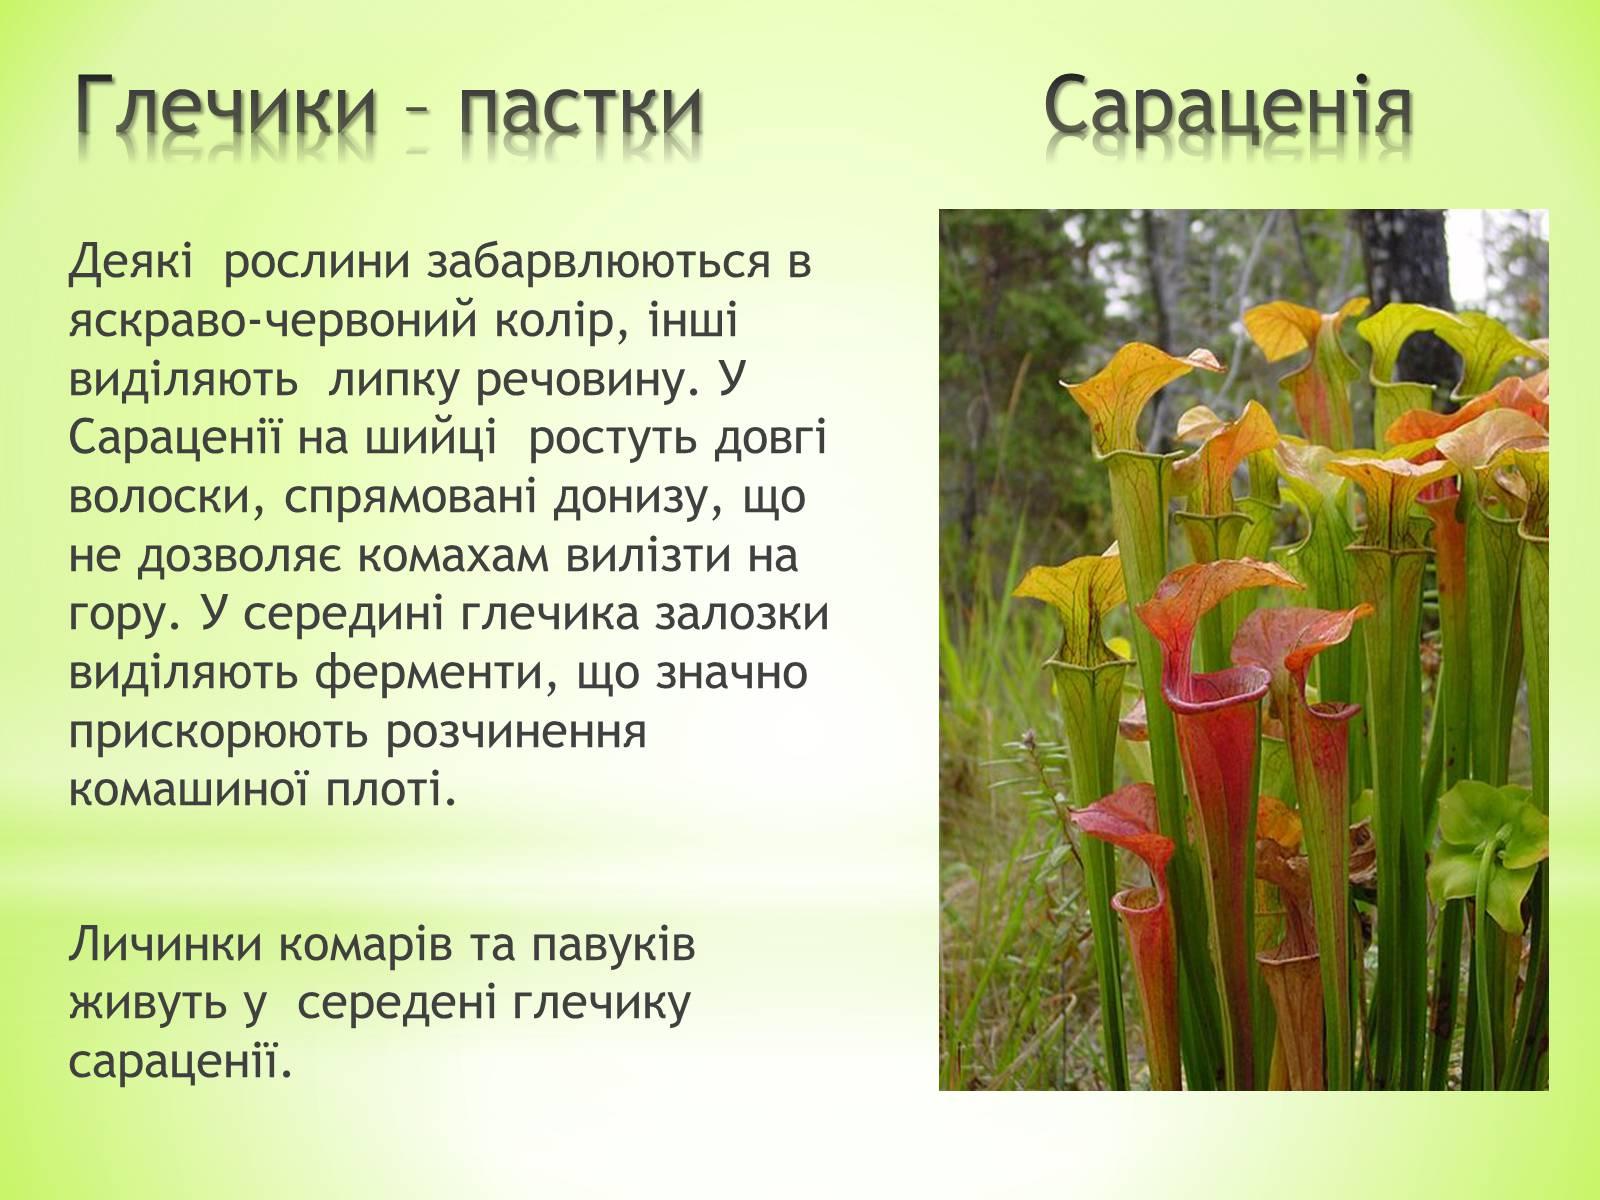 реферат на тему рослини хижаки з картинками разновидности его